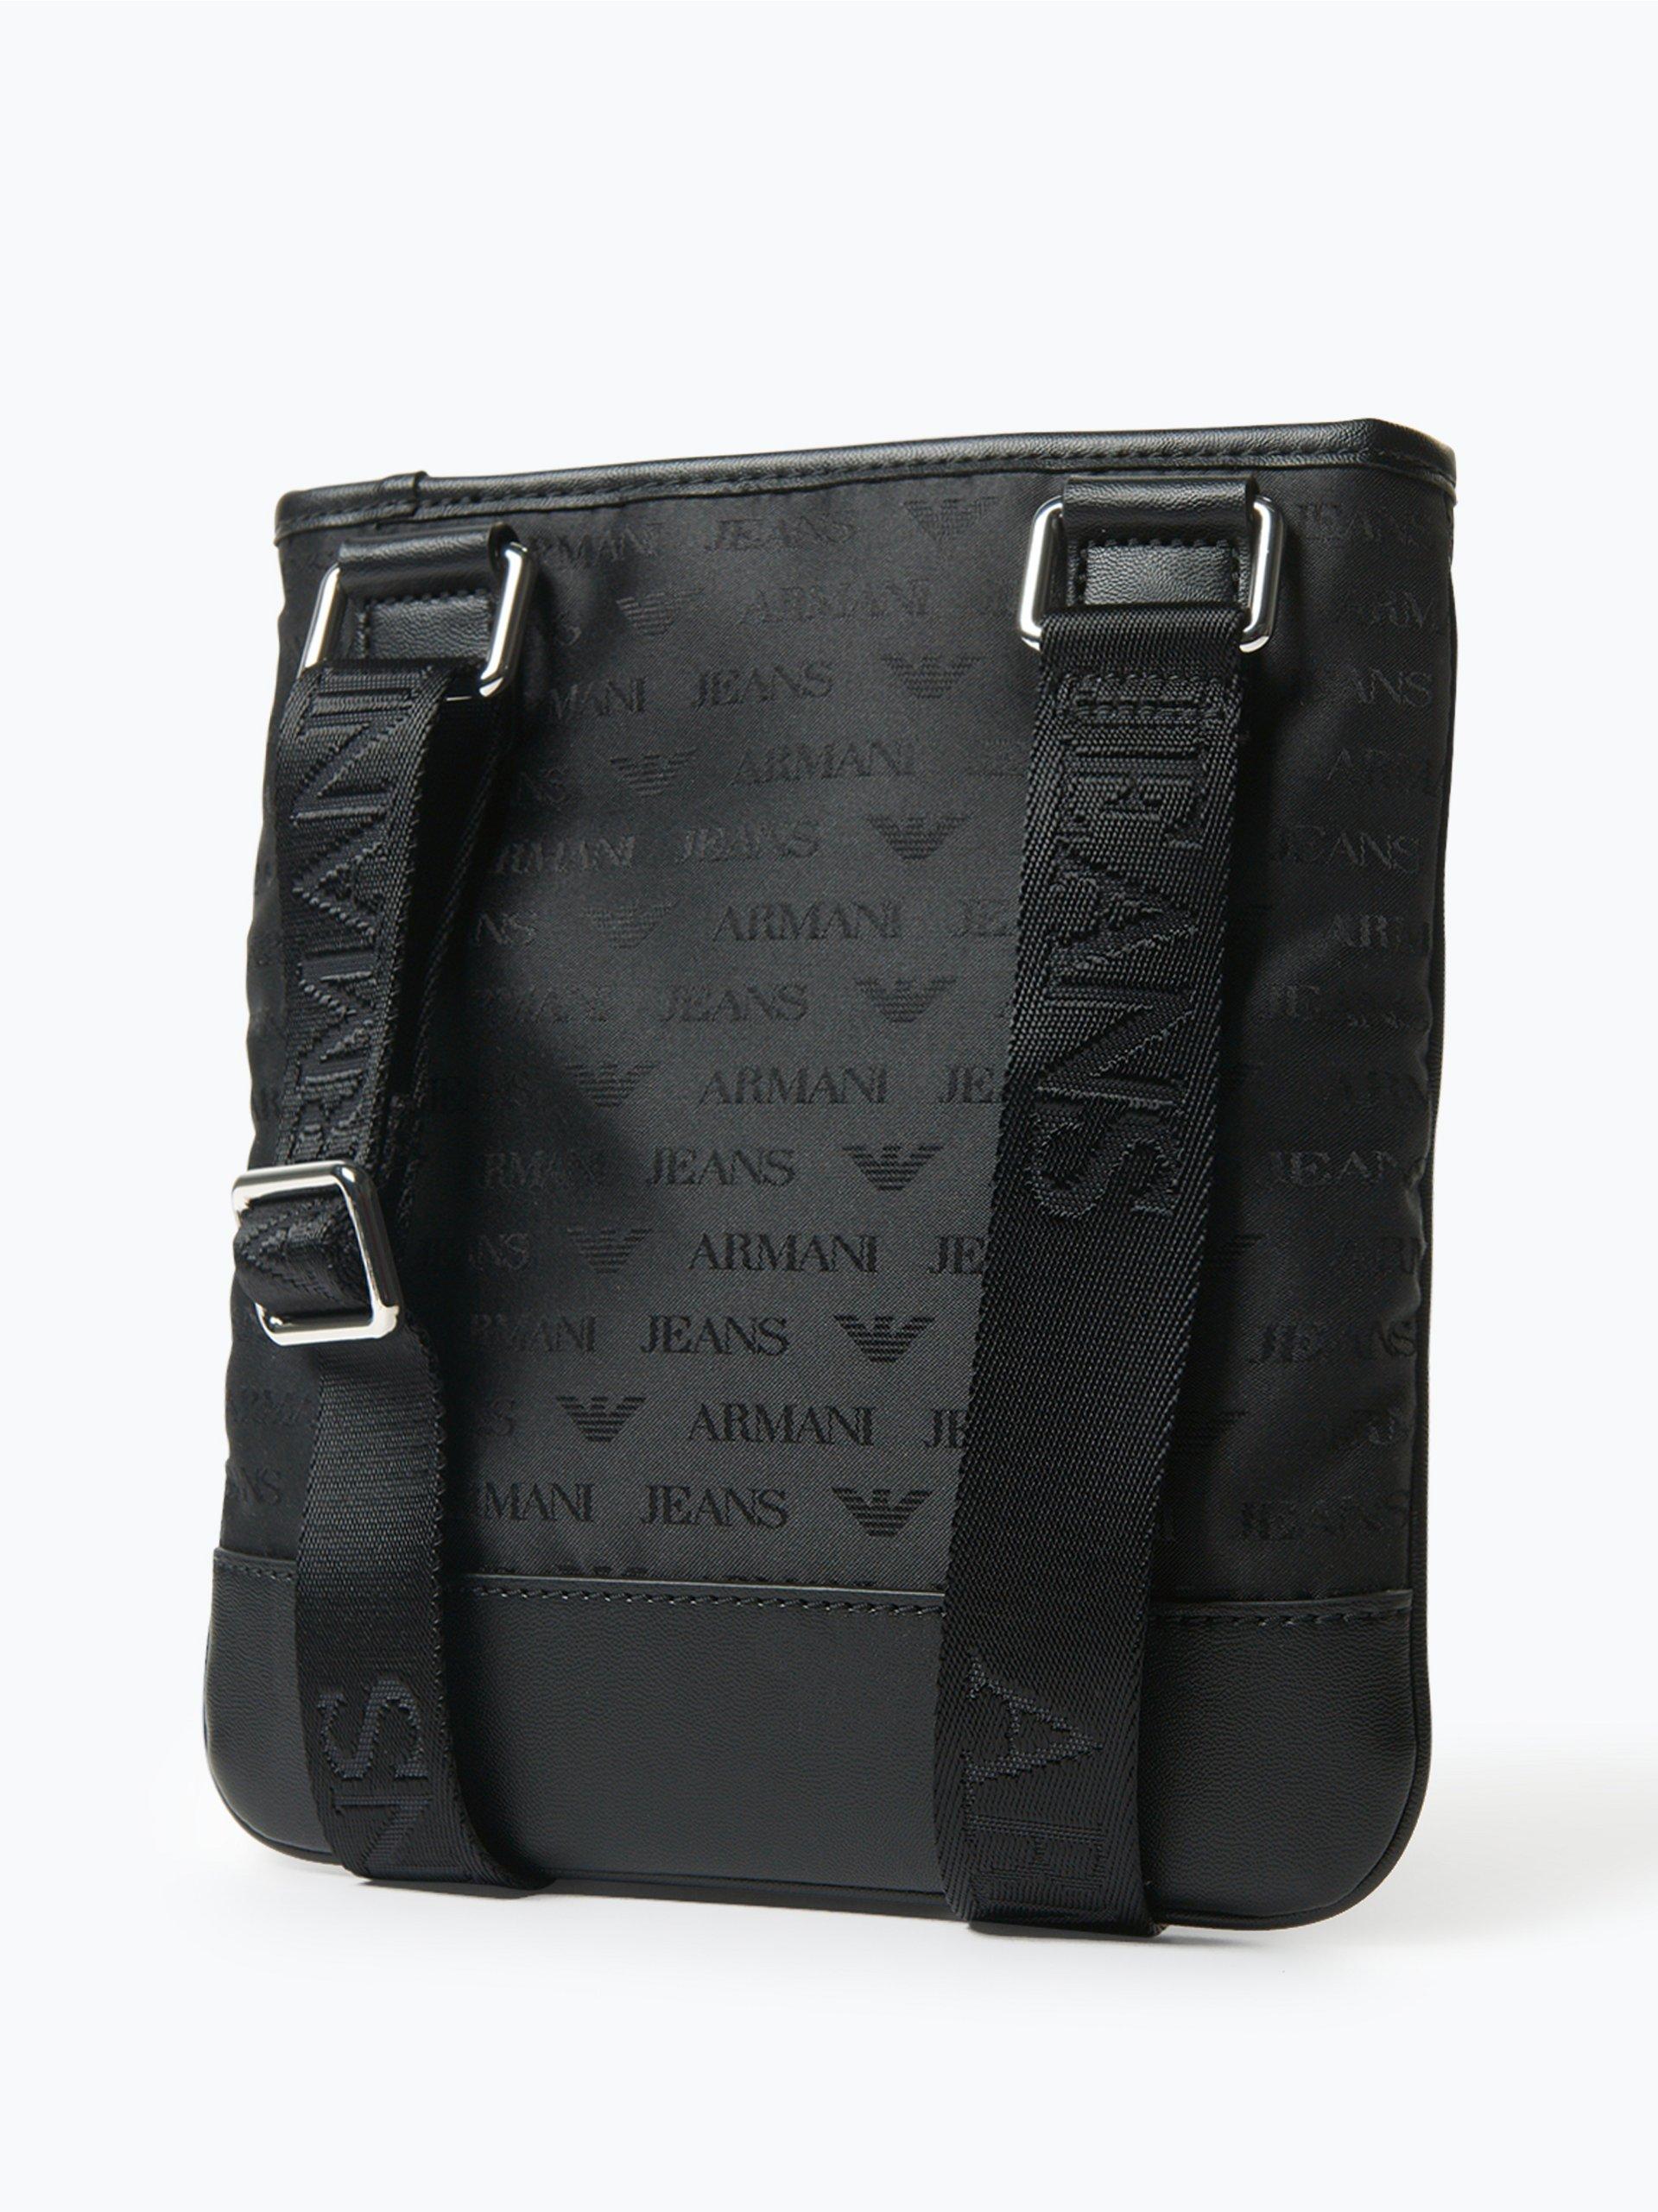 armani jeans herren tasche schwarz gemustert online kaufen. Black Bedroom Furniture Sets. Home Design Ideas